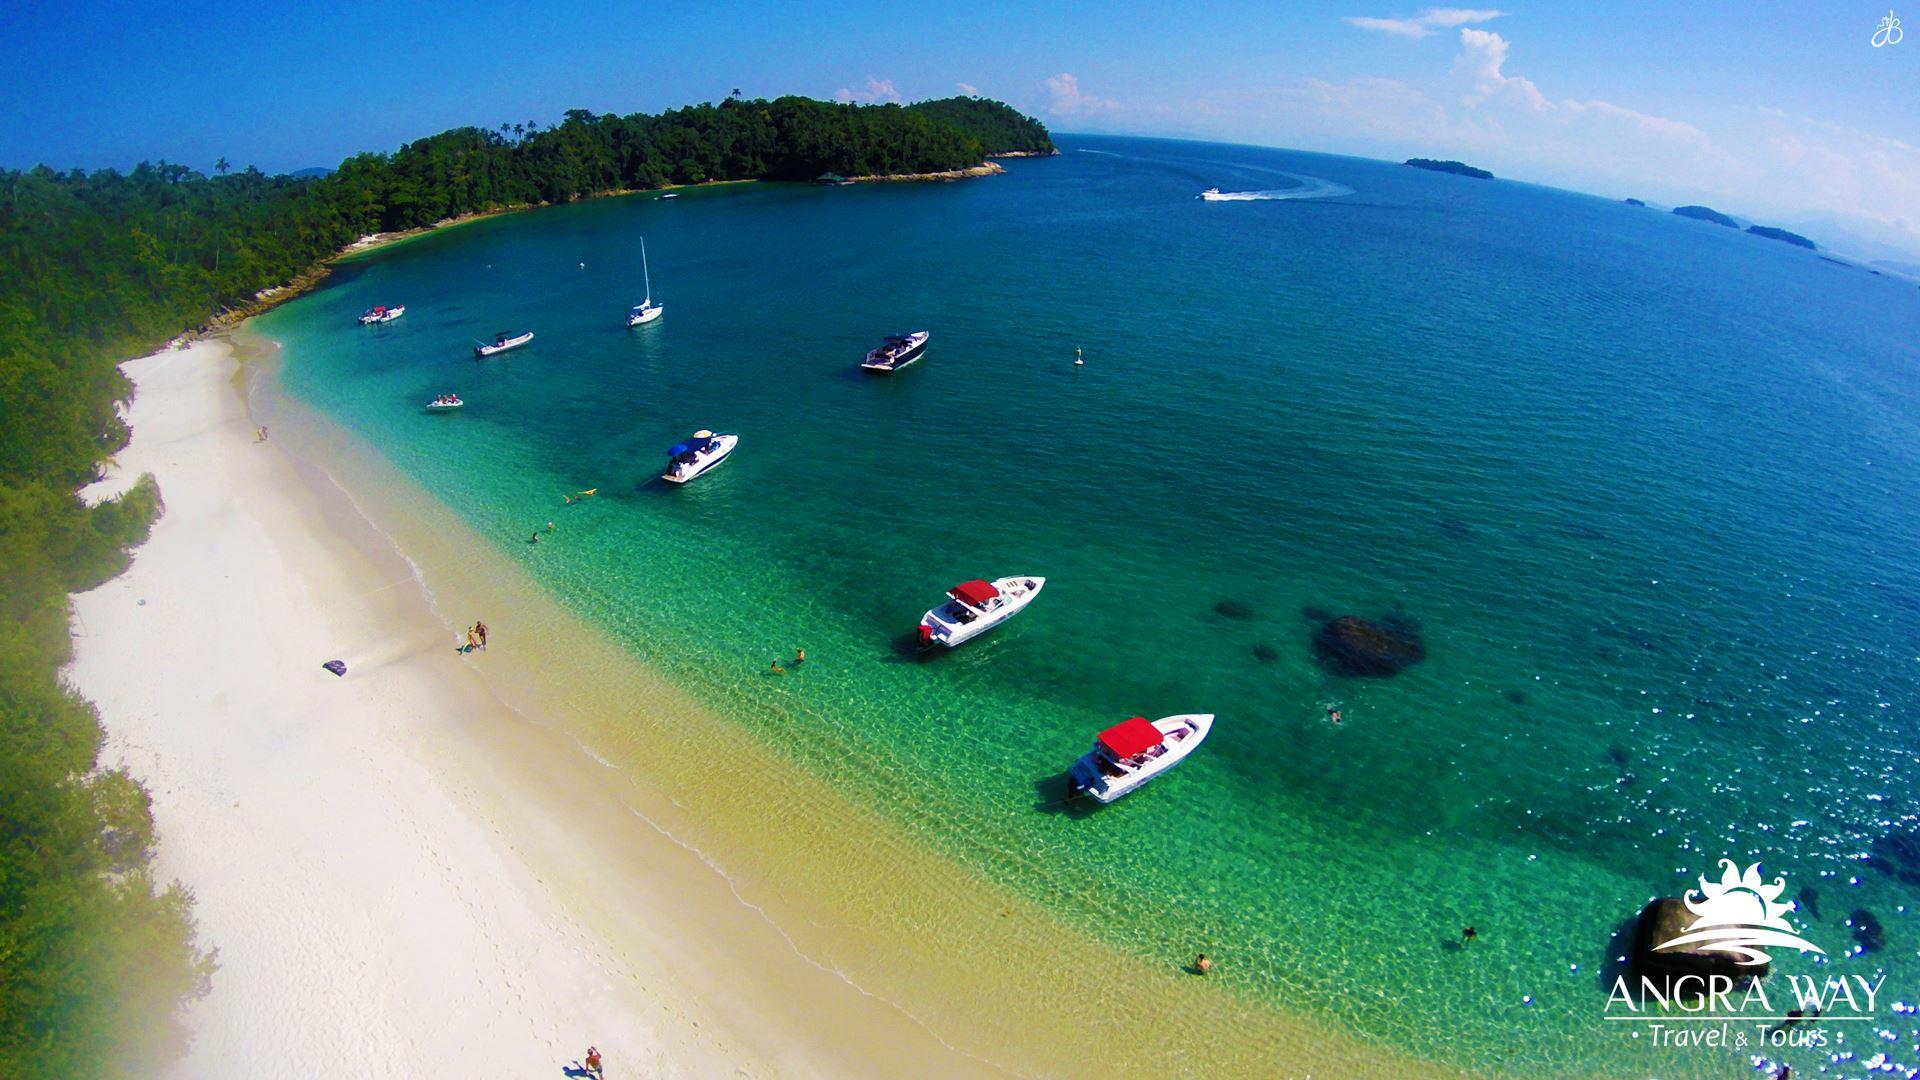 Tour To The Paradisiac Islands Of Angra